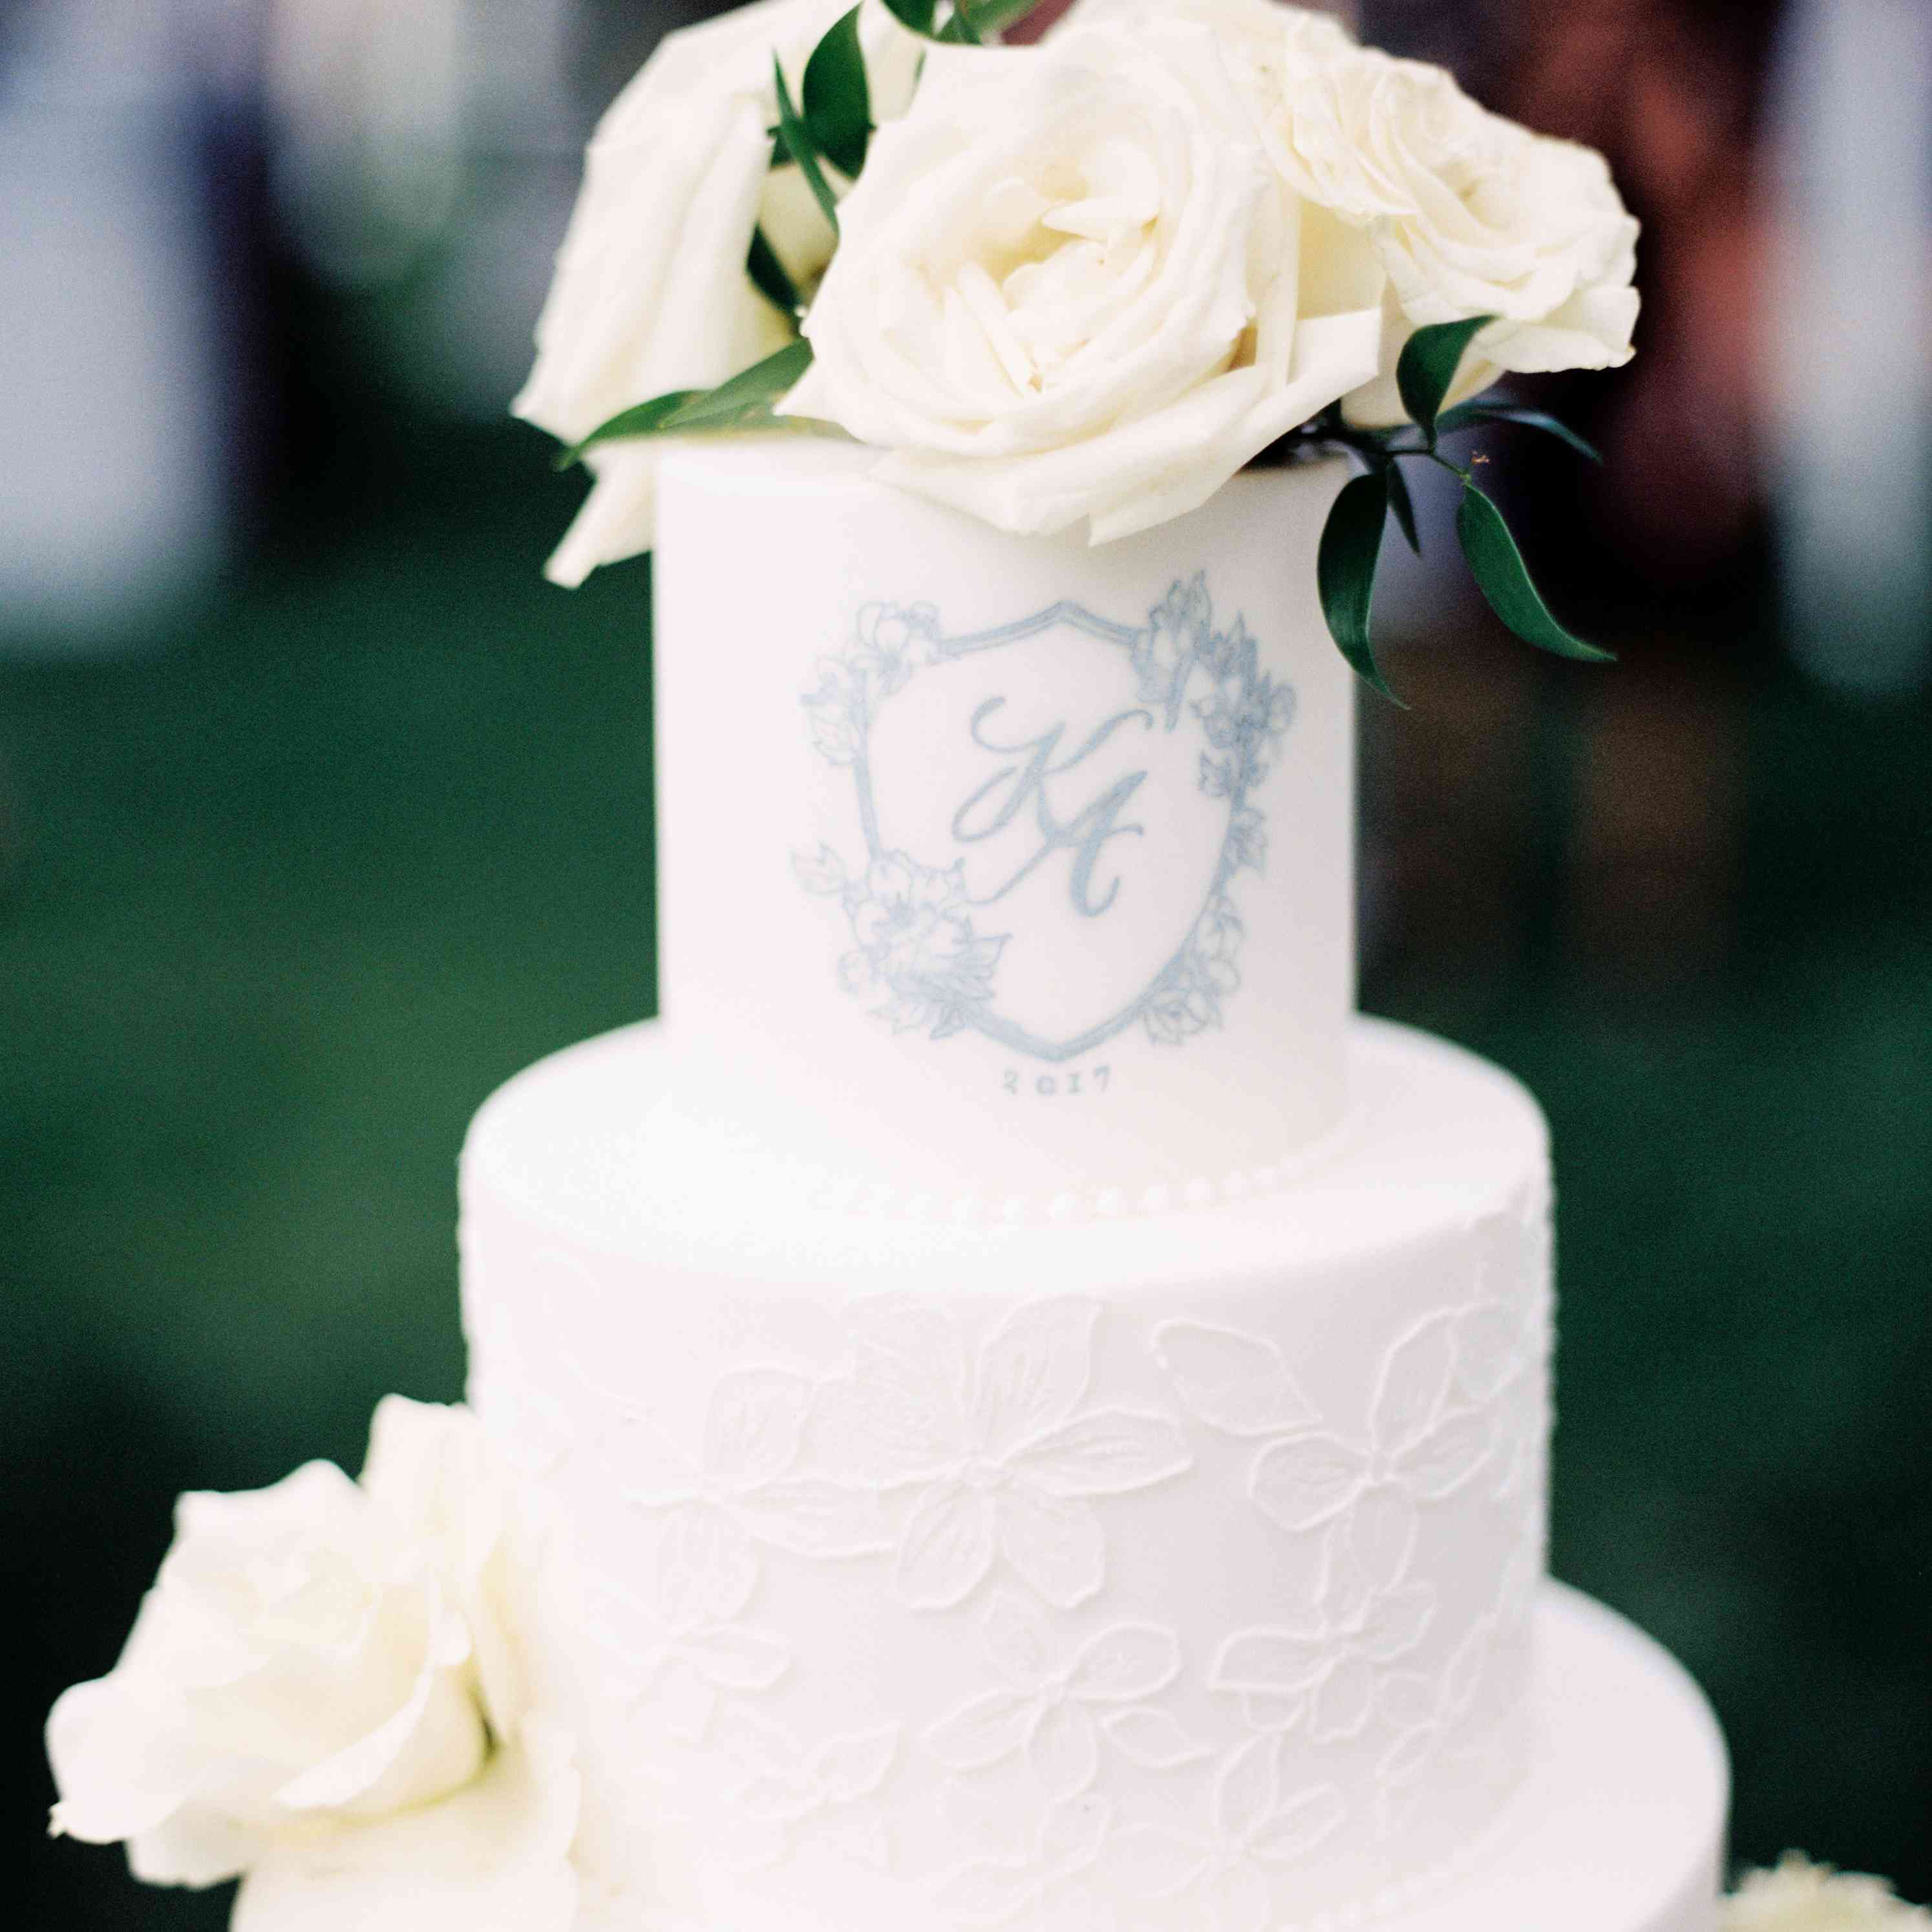 white cake with couple monogram